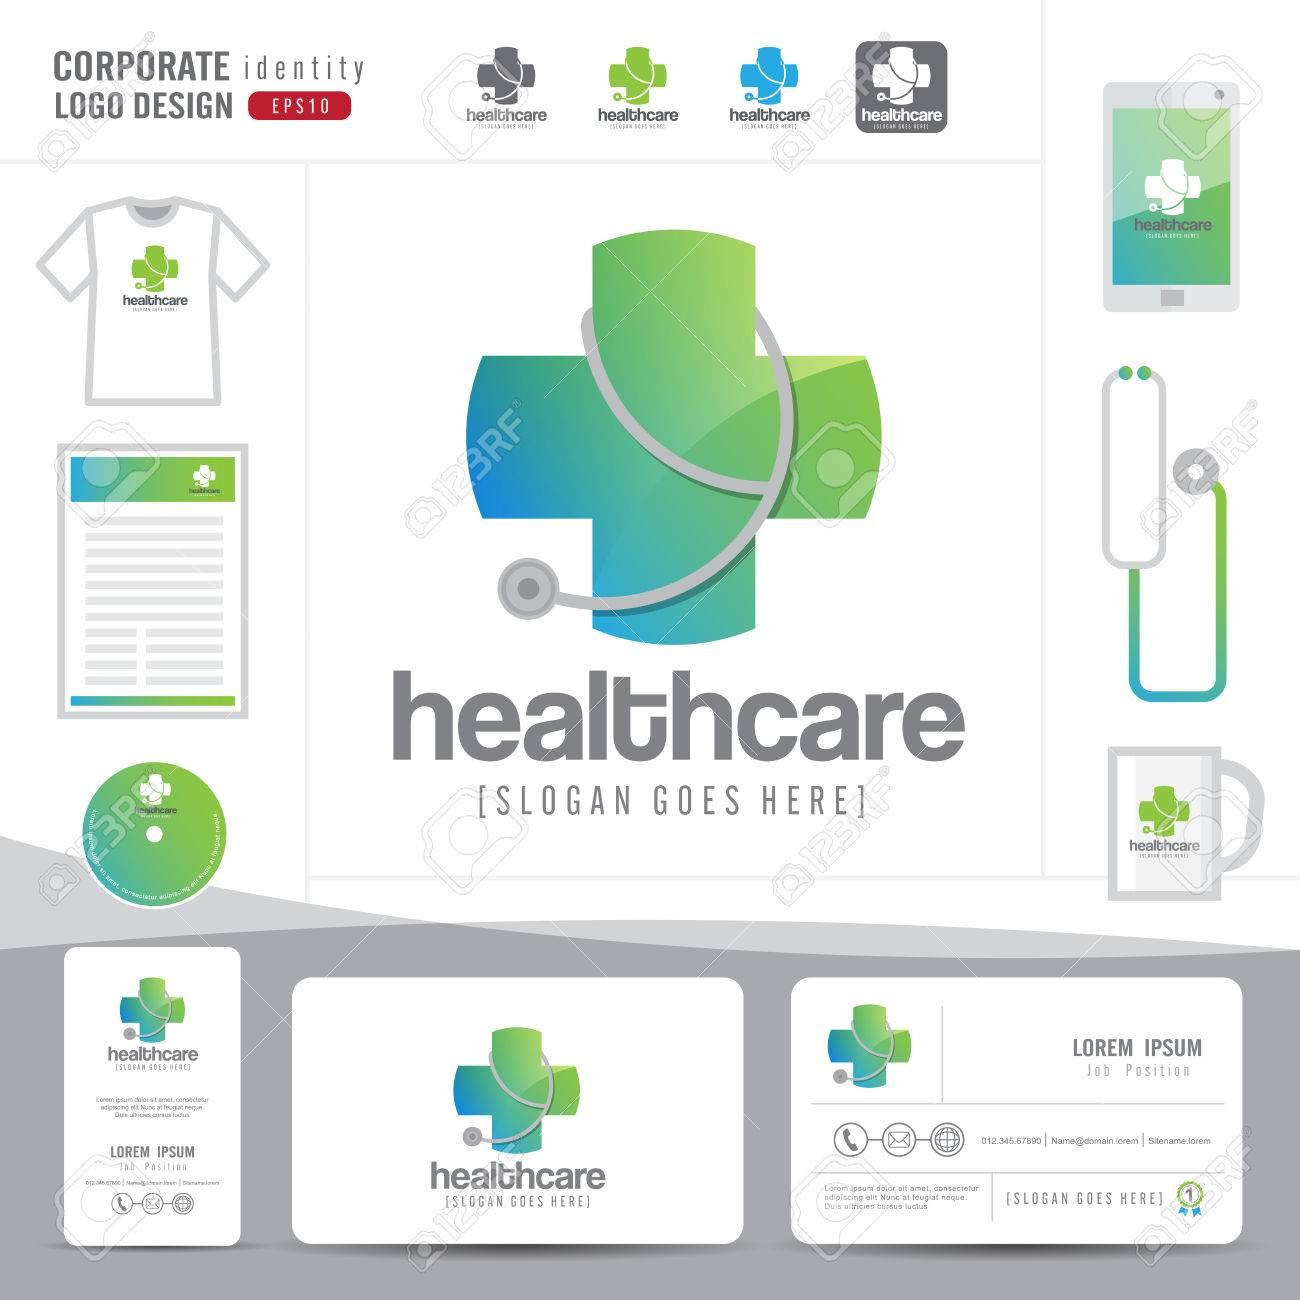 logo design medical healthcare or hospital and business card